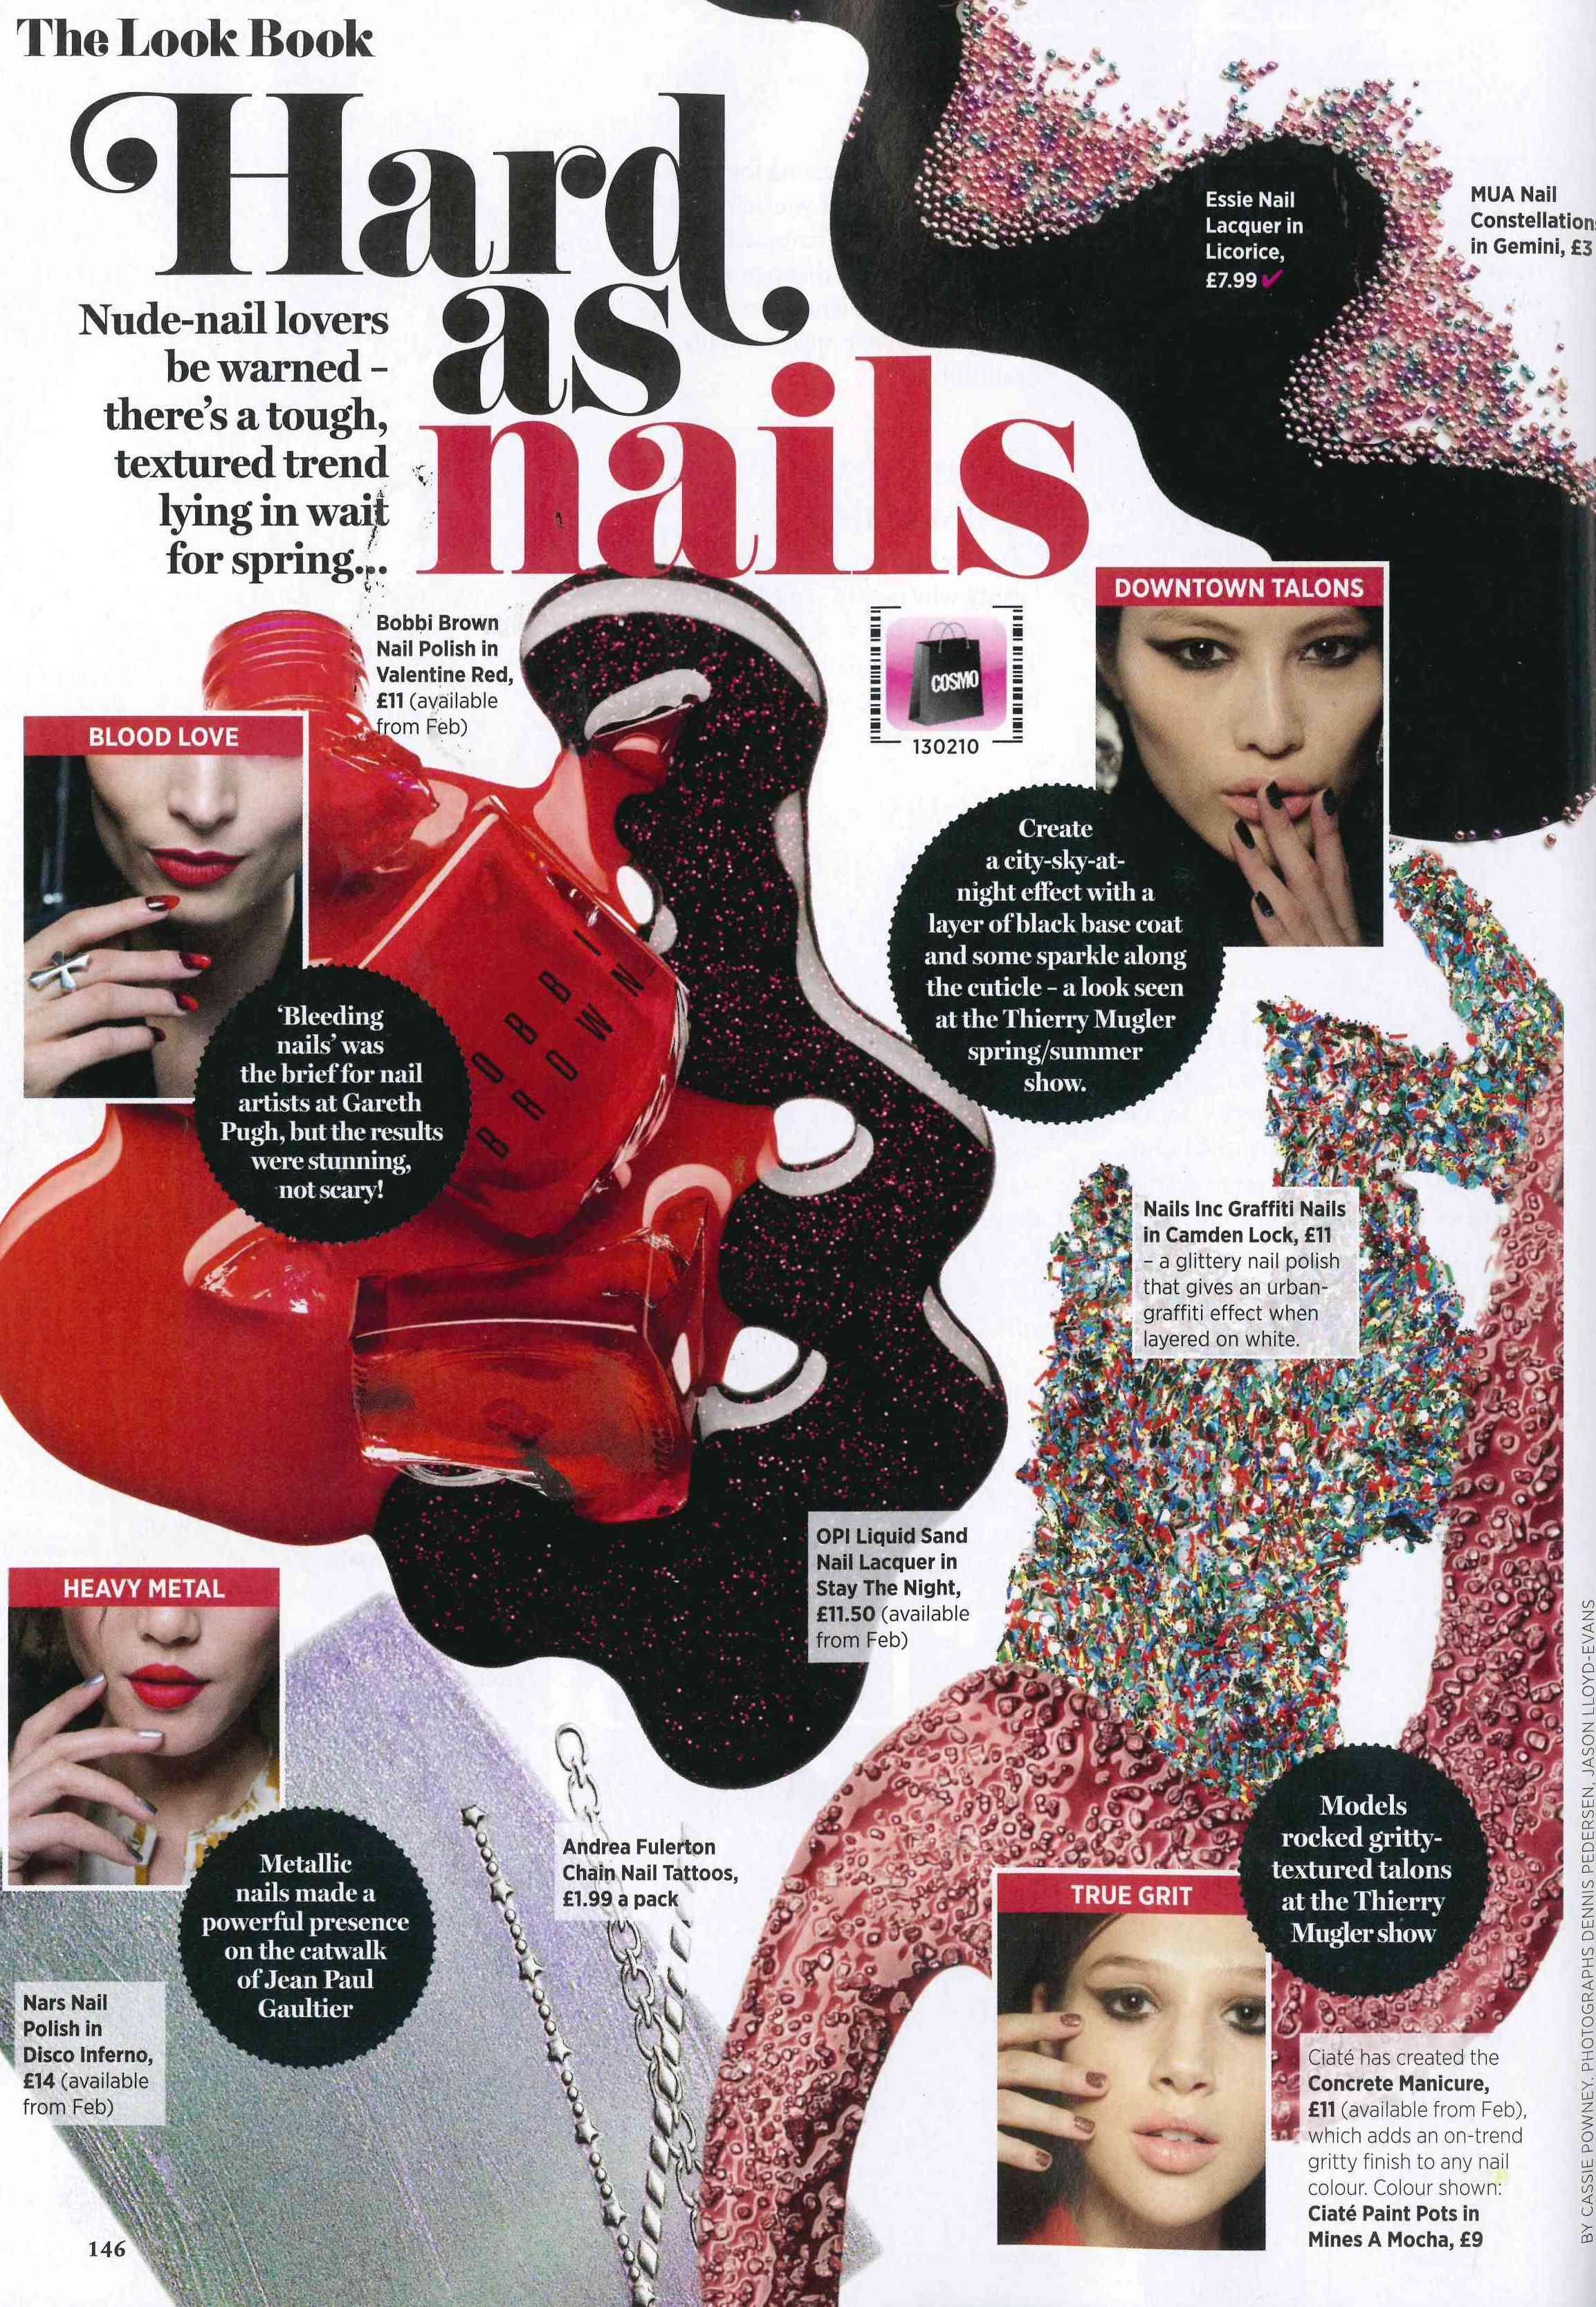 Ciate Featured In Cosmopolitan Magazine (February 2013